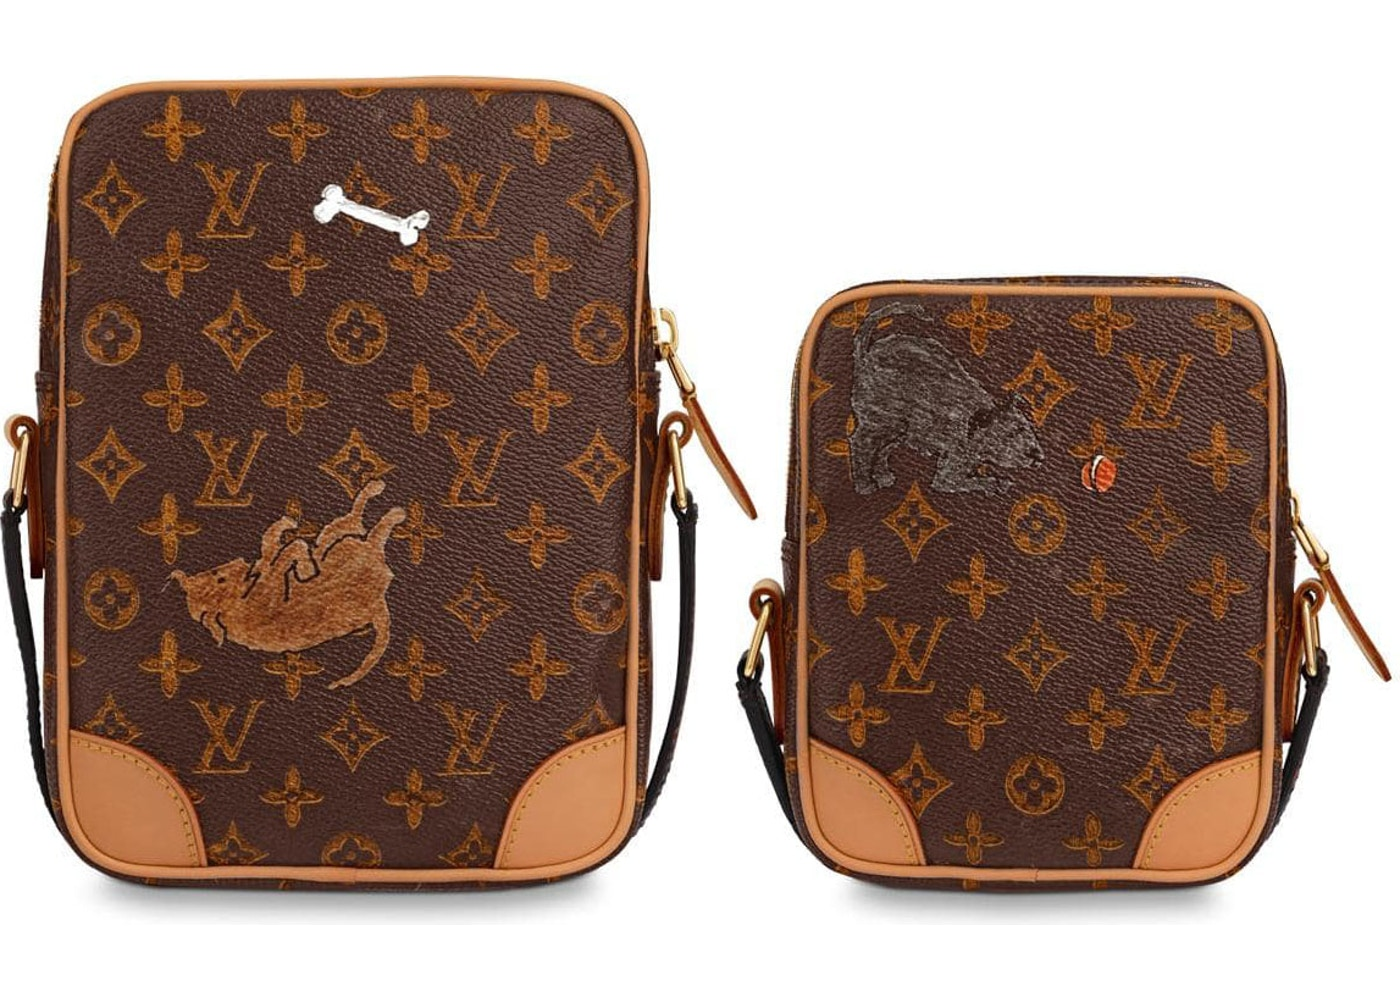 8c60f970b Louis Vuitton Paname Set Monogram Catogram Brown/Orange